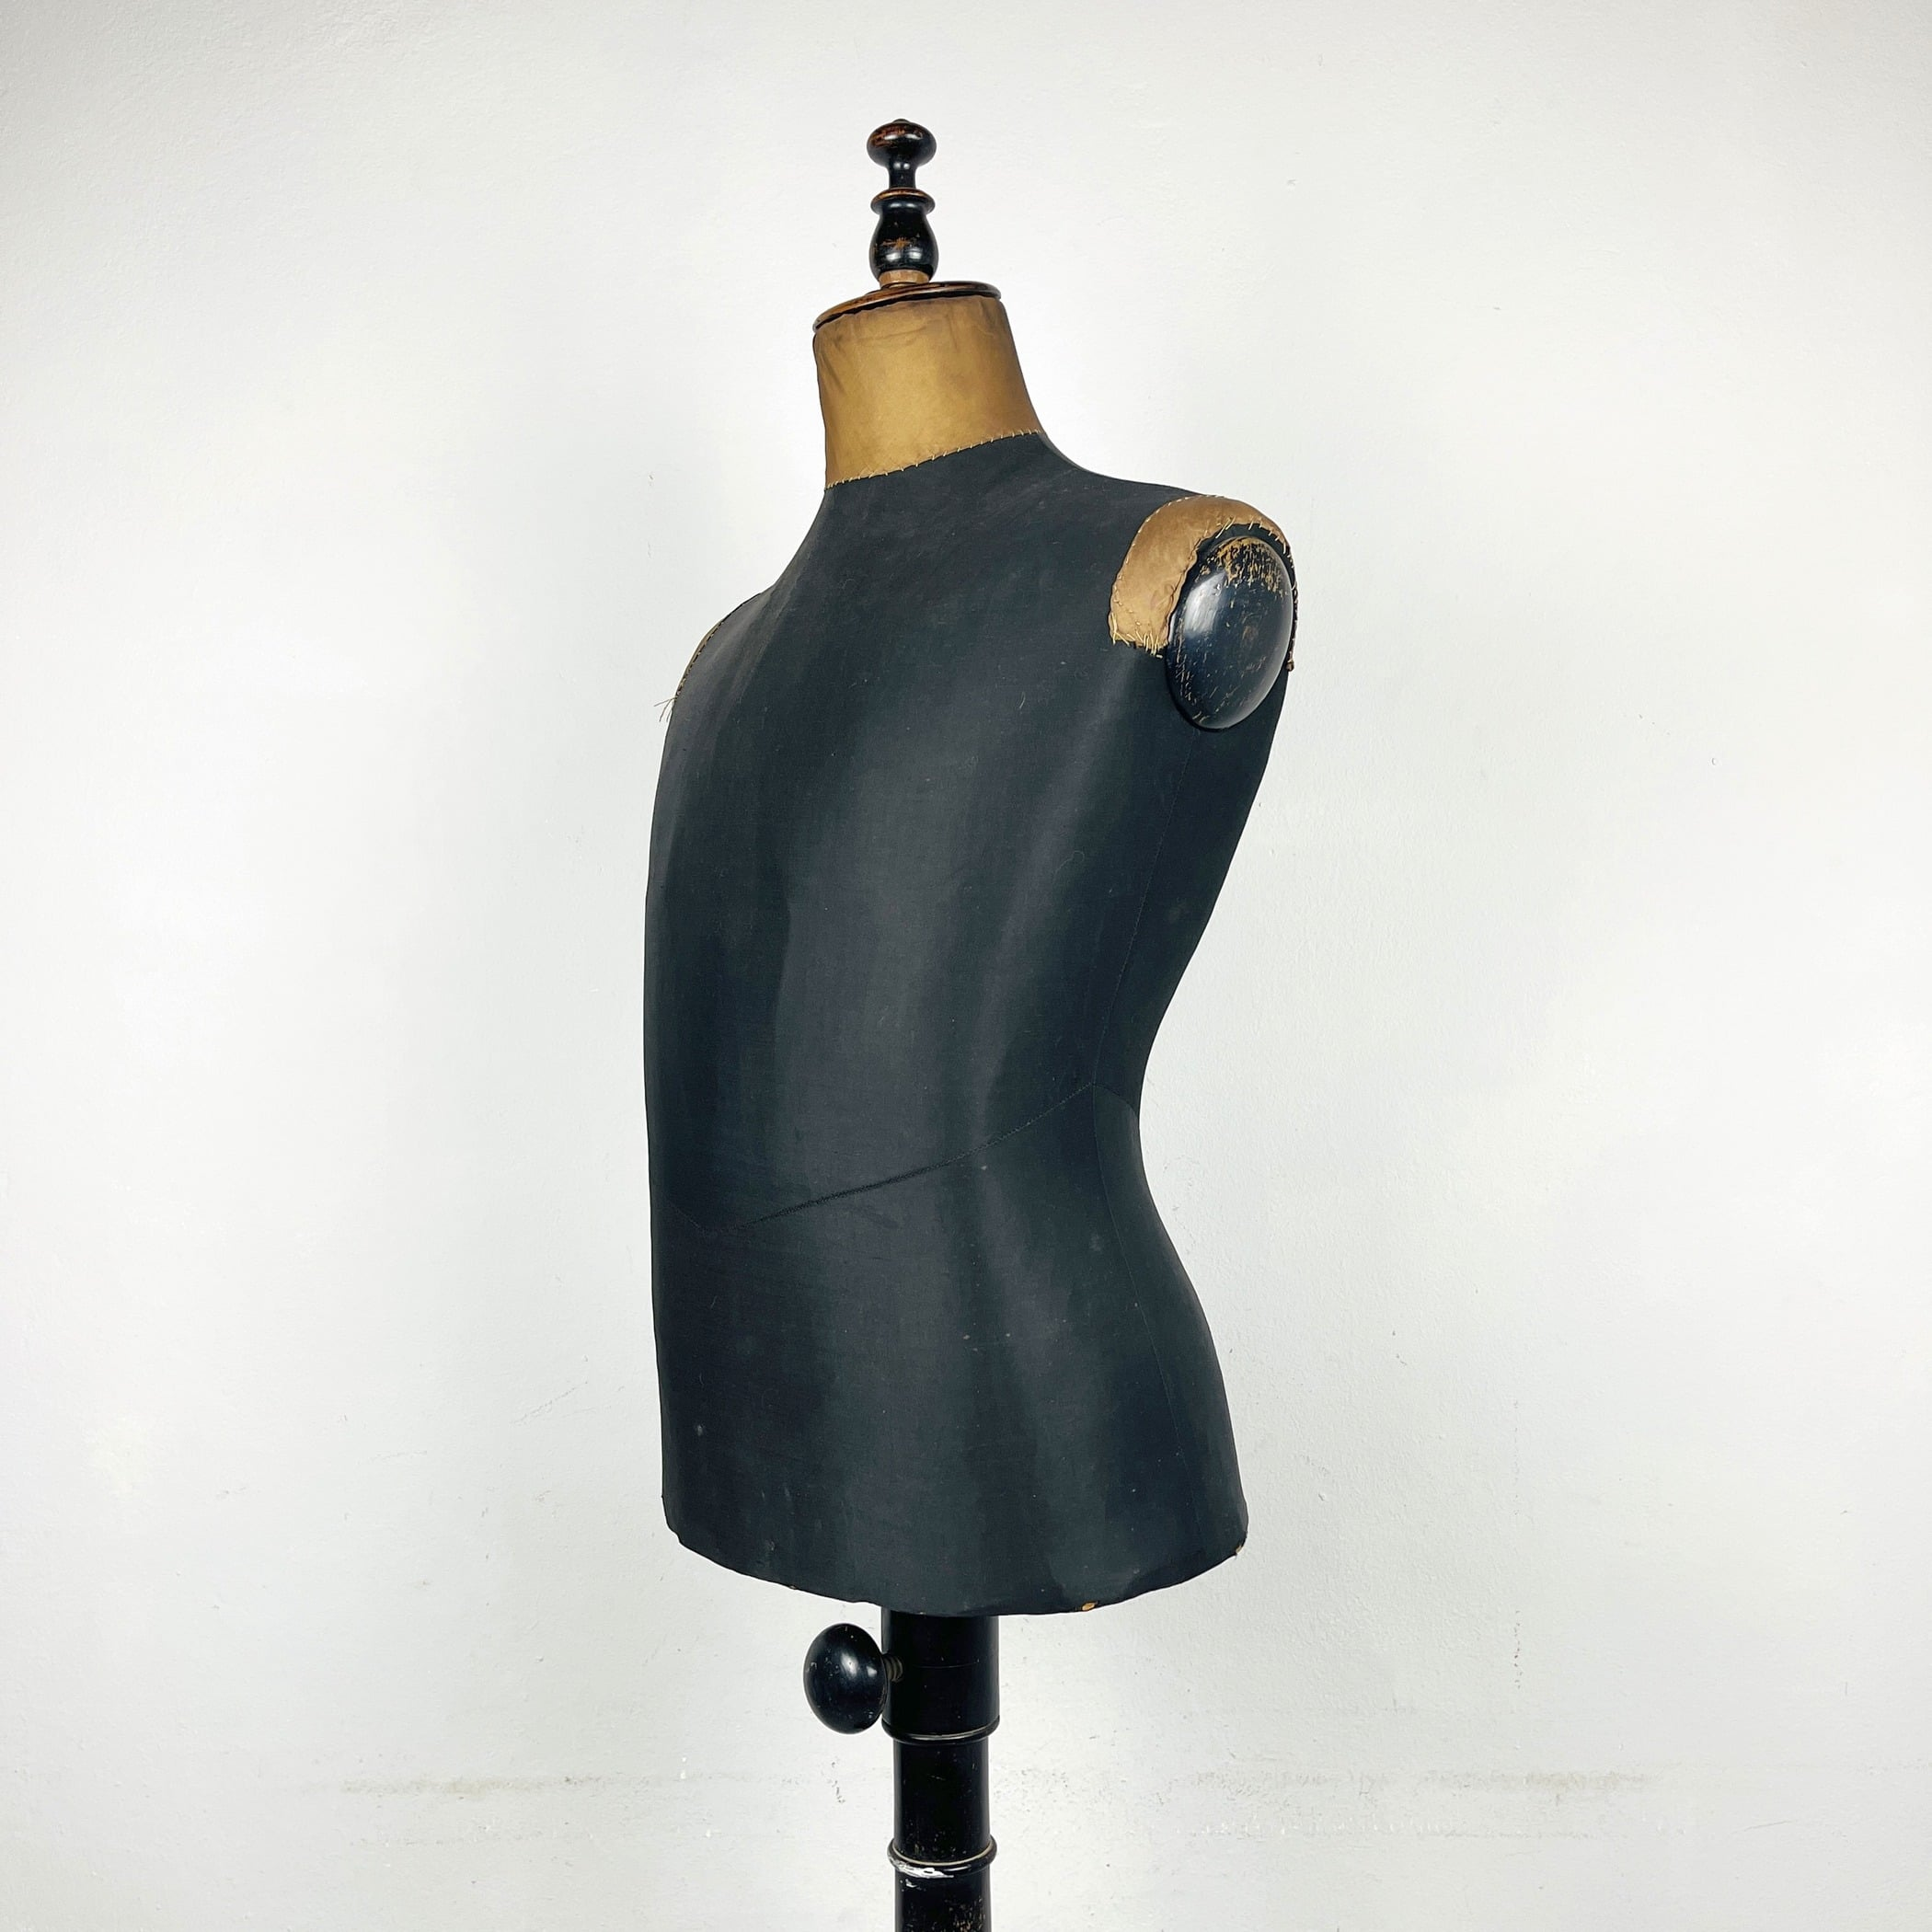 Antique man dress mannequin Austria 1930s shabby chic cottage home vintage tailor's dummy shop display dress form